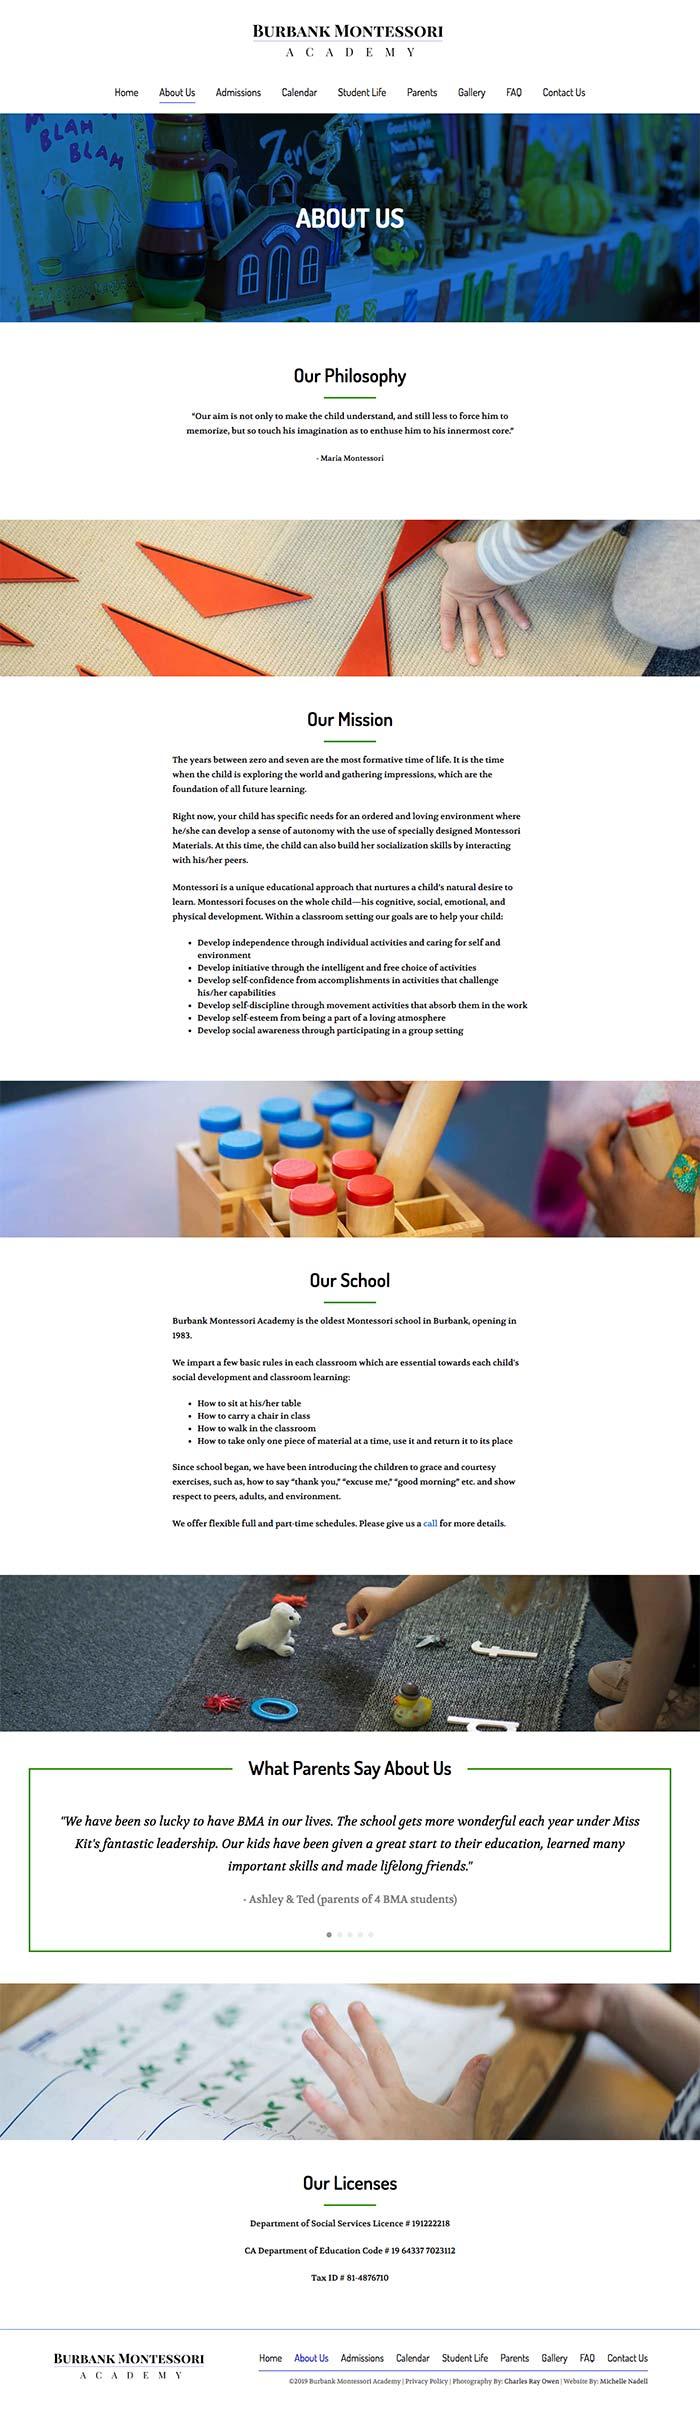 Burbank Montessori Academy about page screen shot